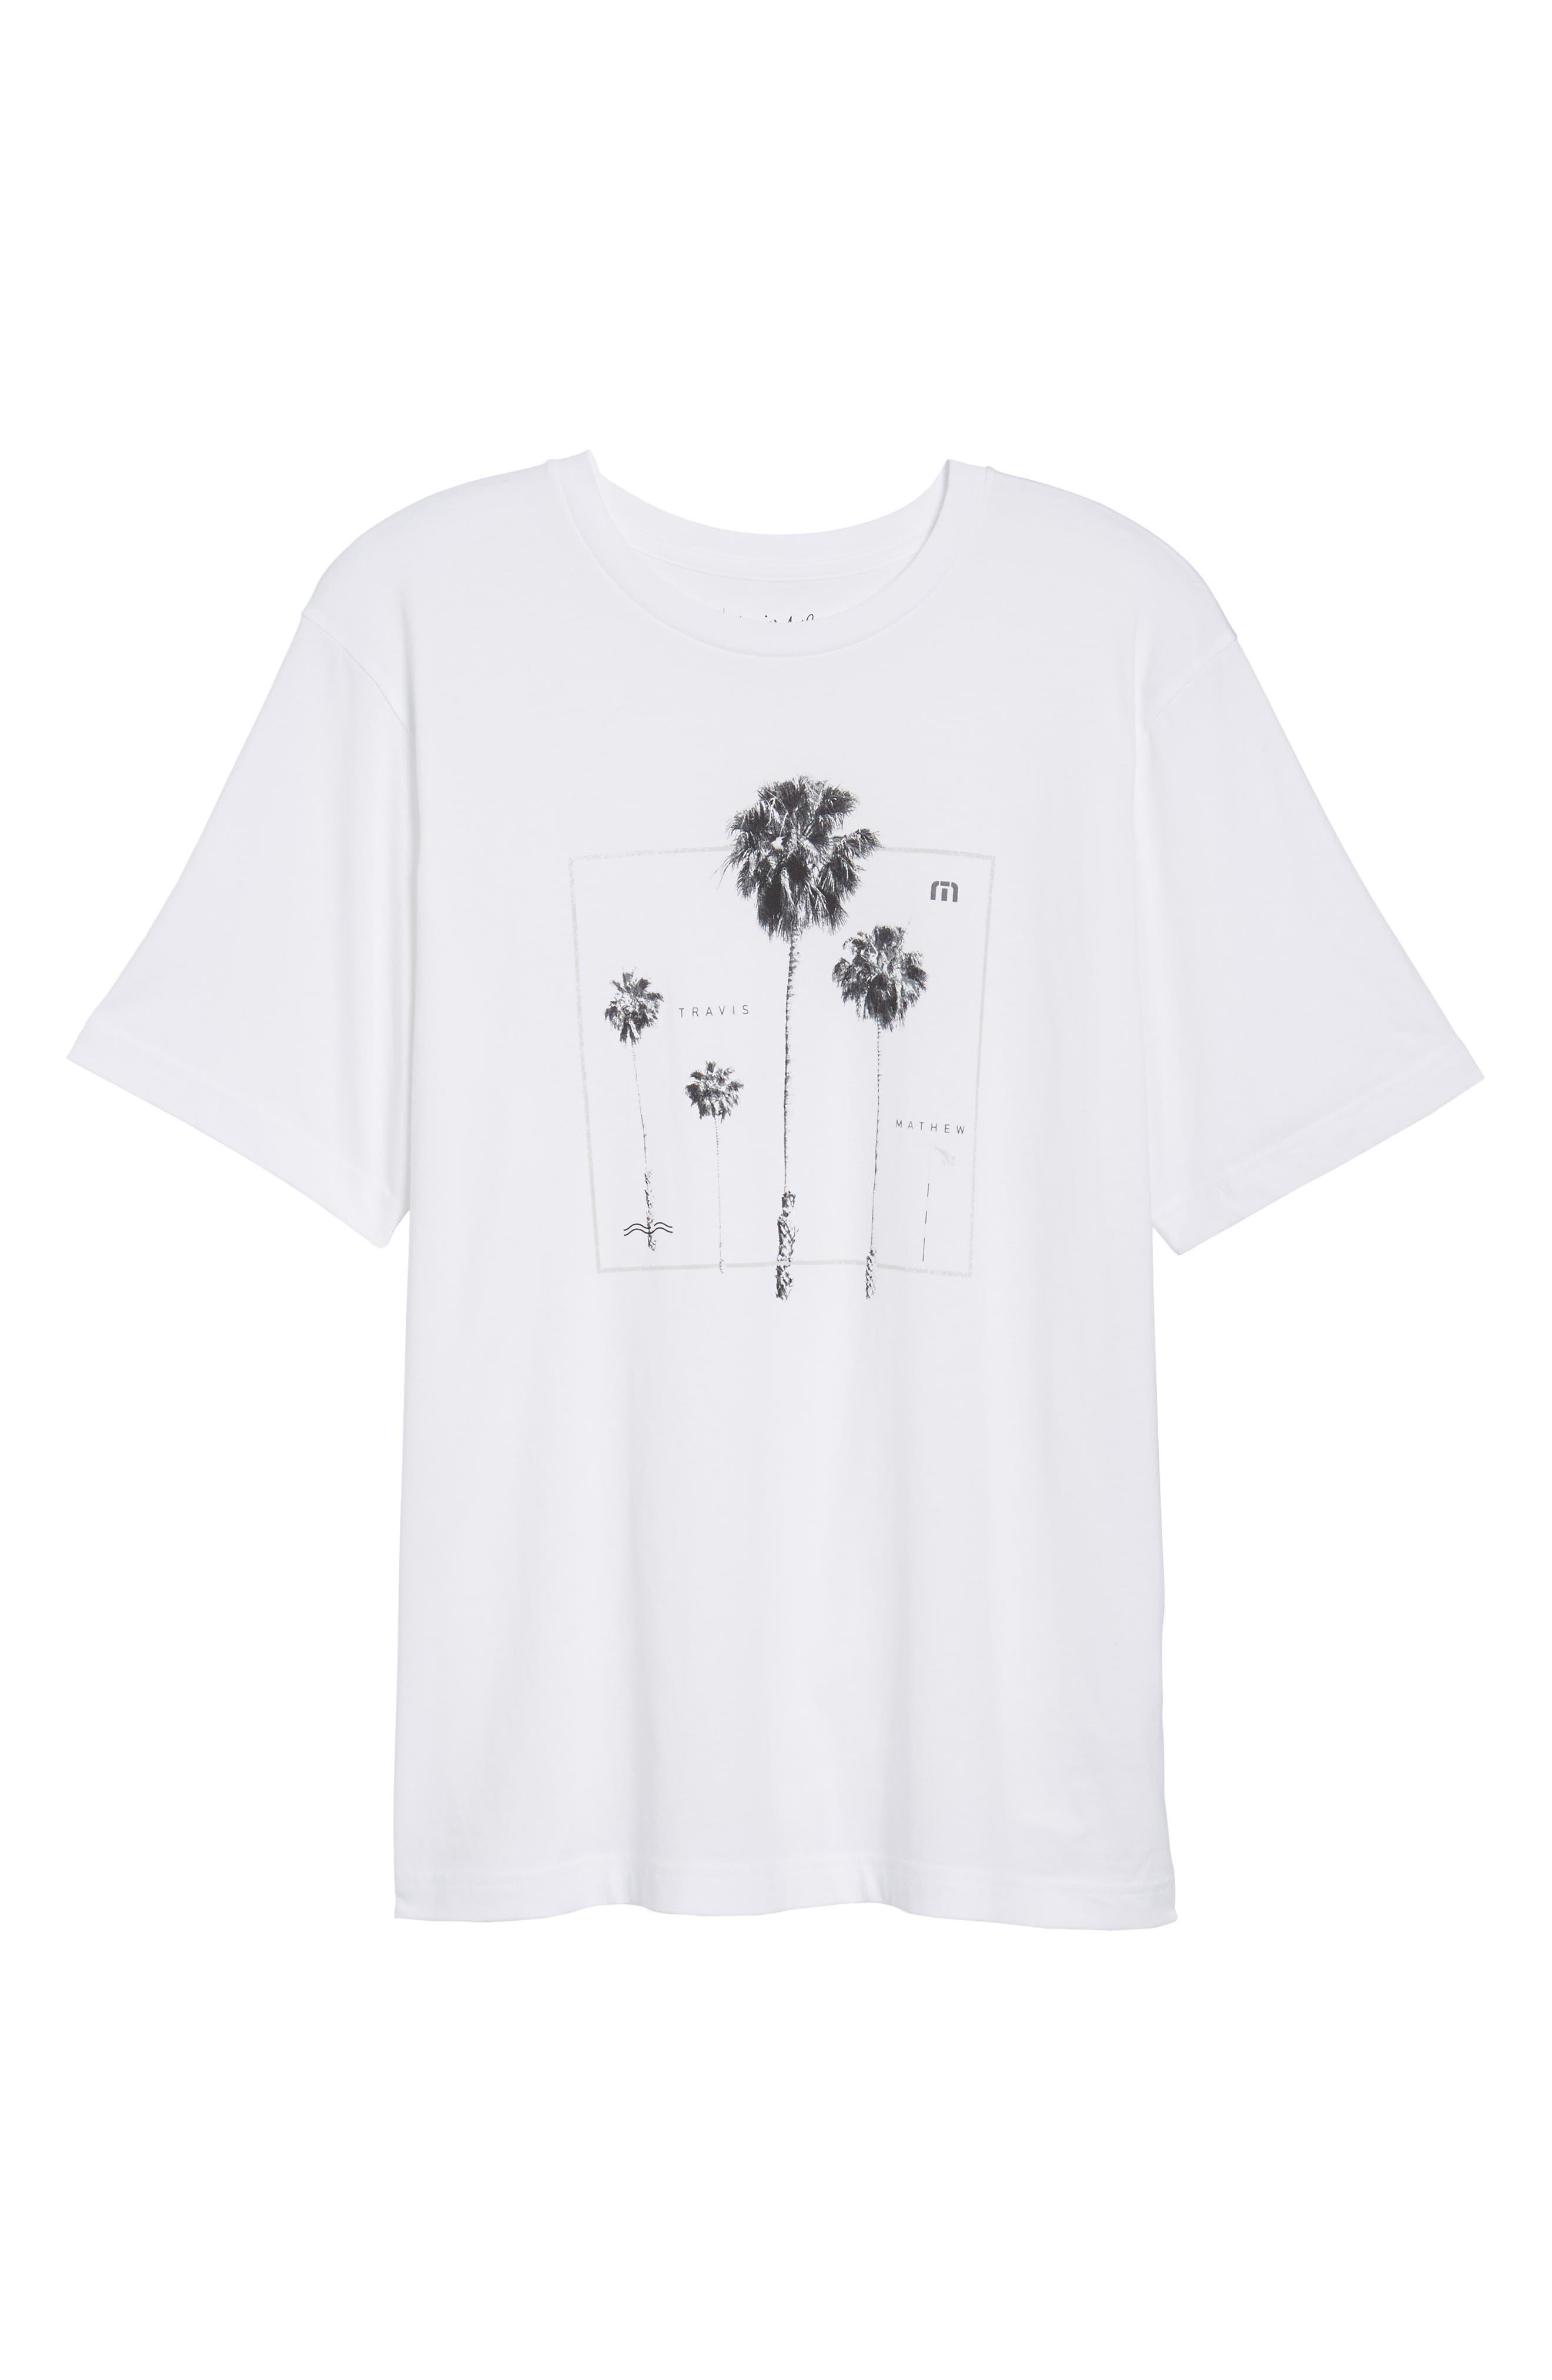 Play Hard Graphic T-Shirt,                             Alternate thumbnail 6, color,                             100